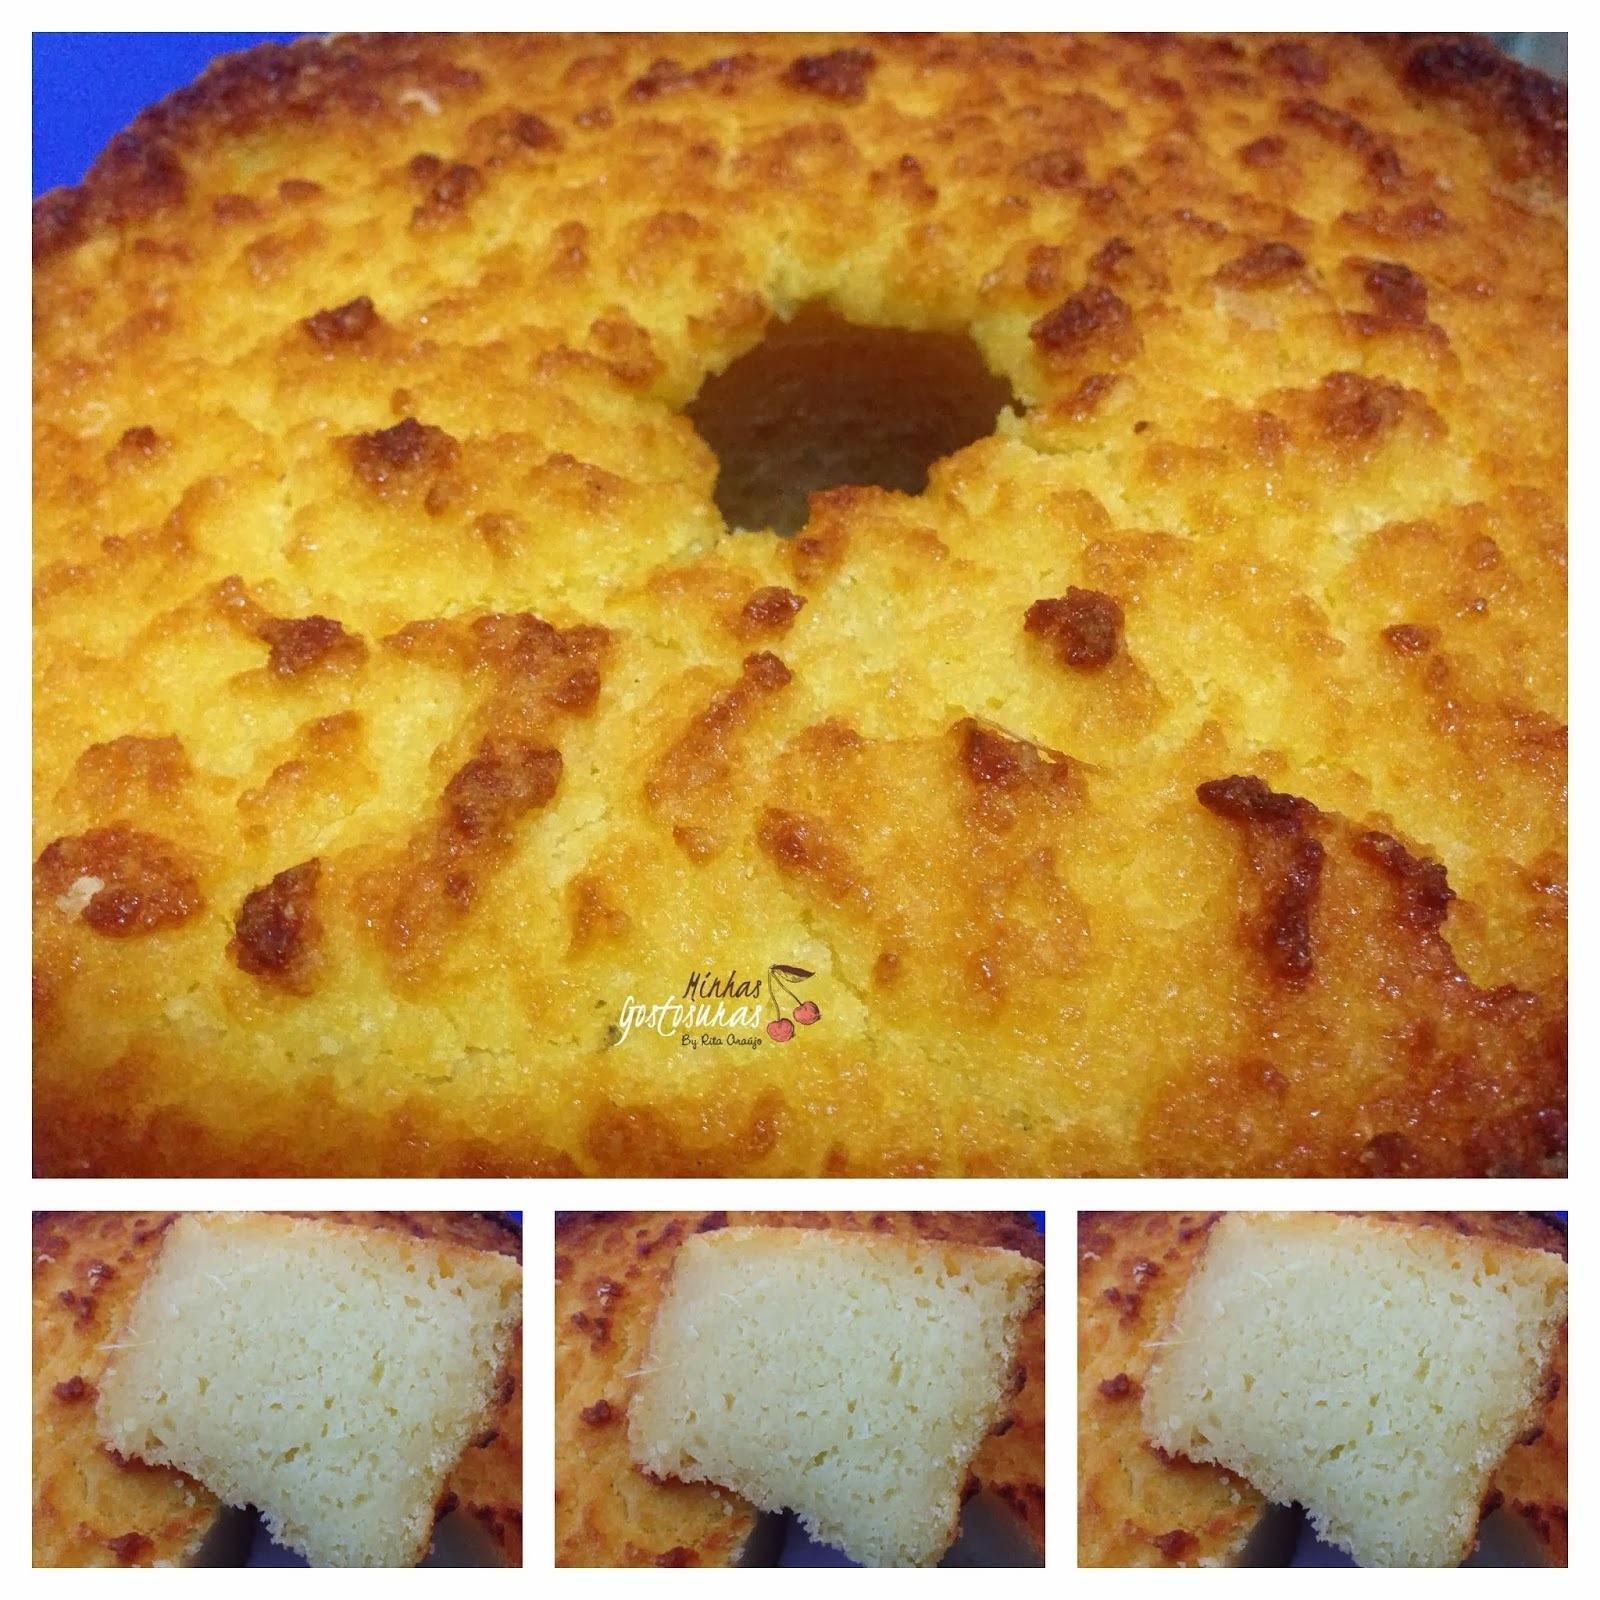 bolo de aipim cozido no liquidificador